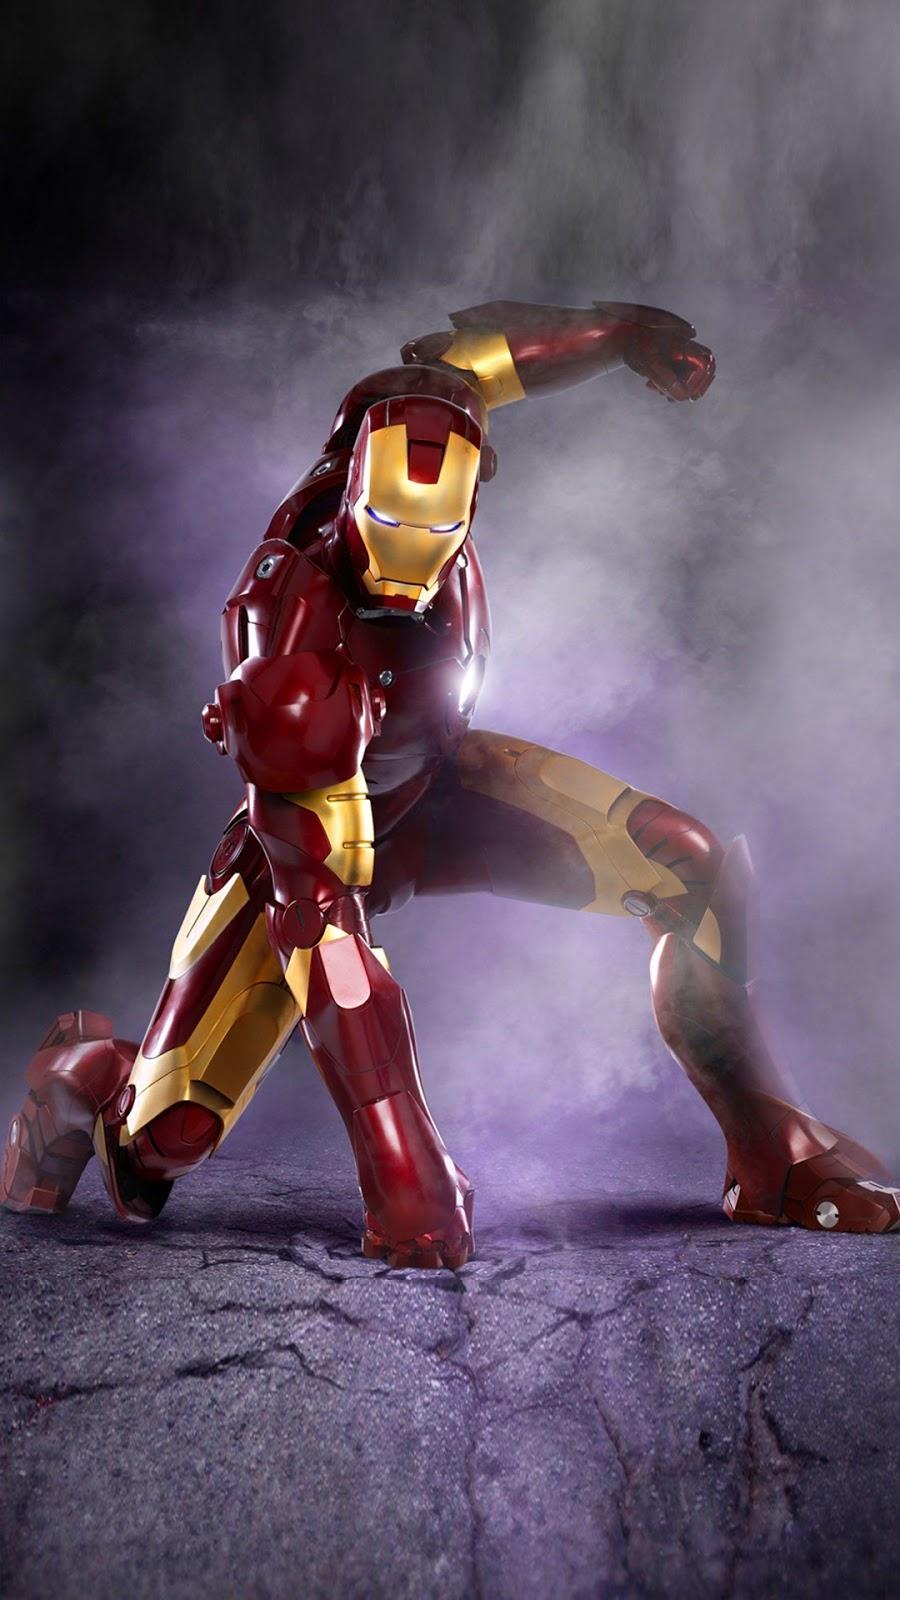 hp ironman oneplus 6 avenger edition